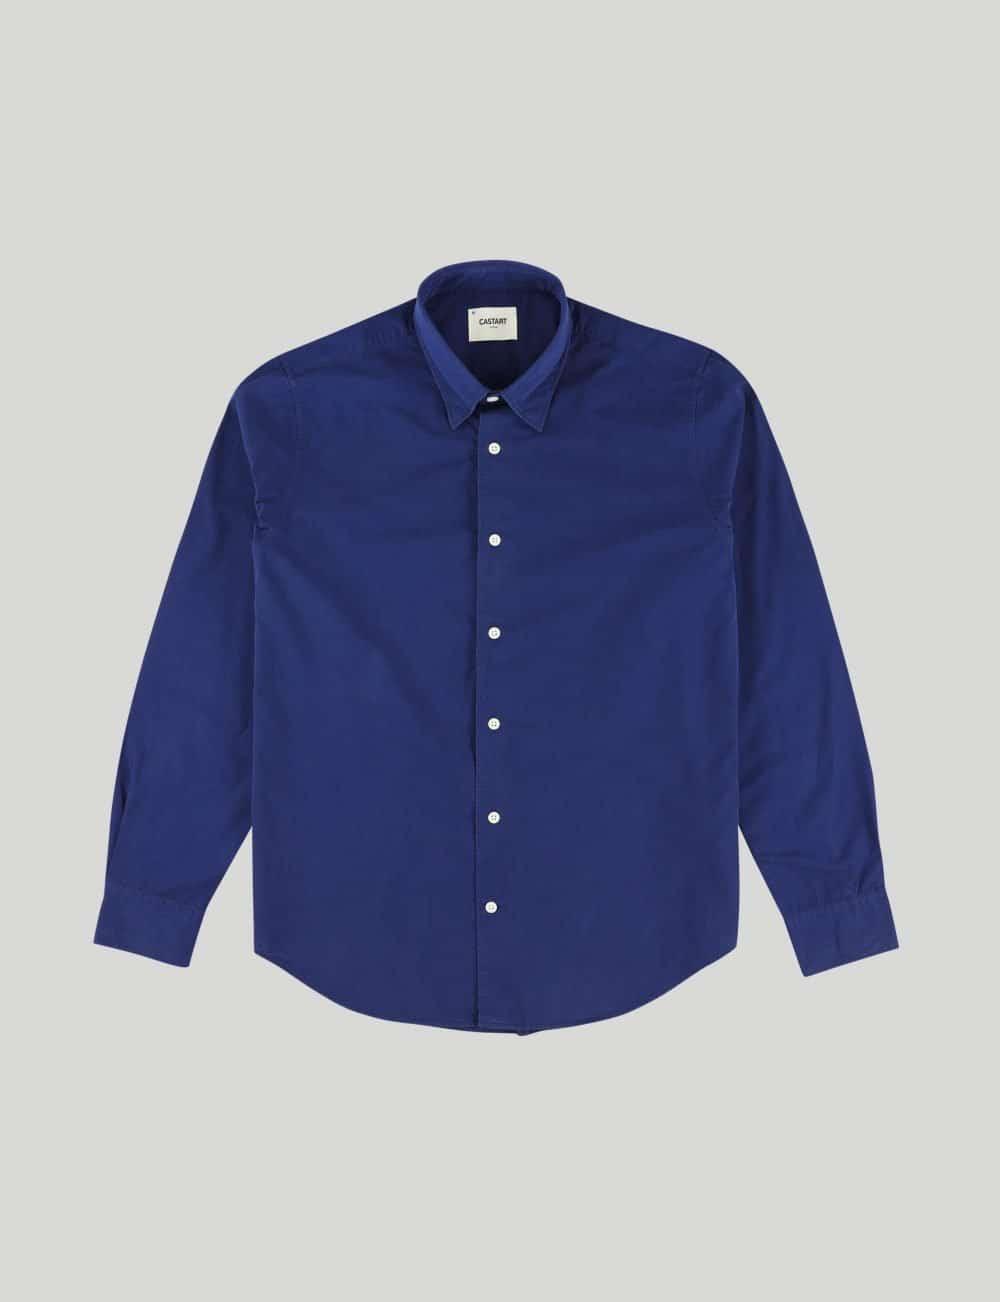 Castart - Lion's Mane Shirt - Navy